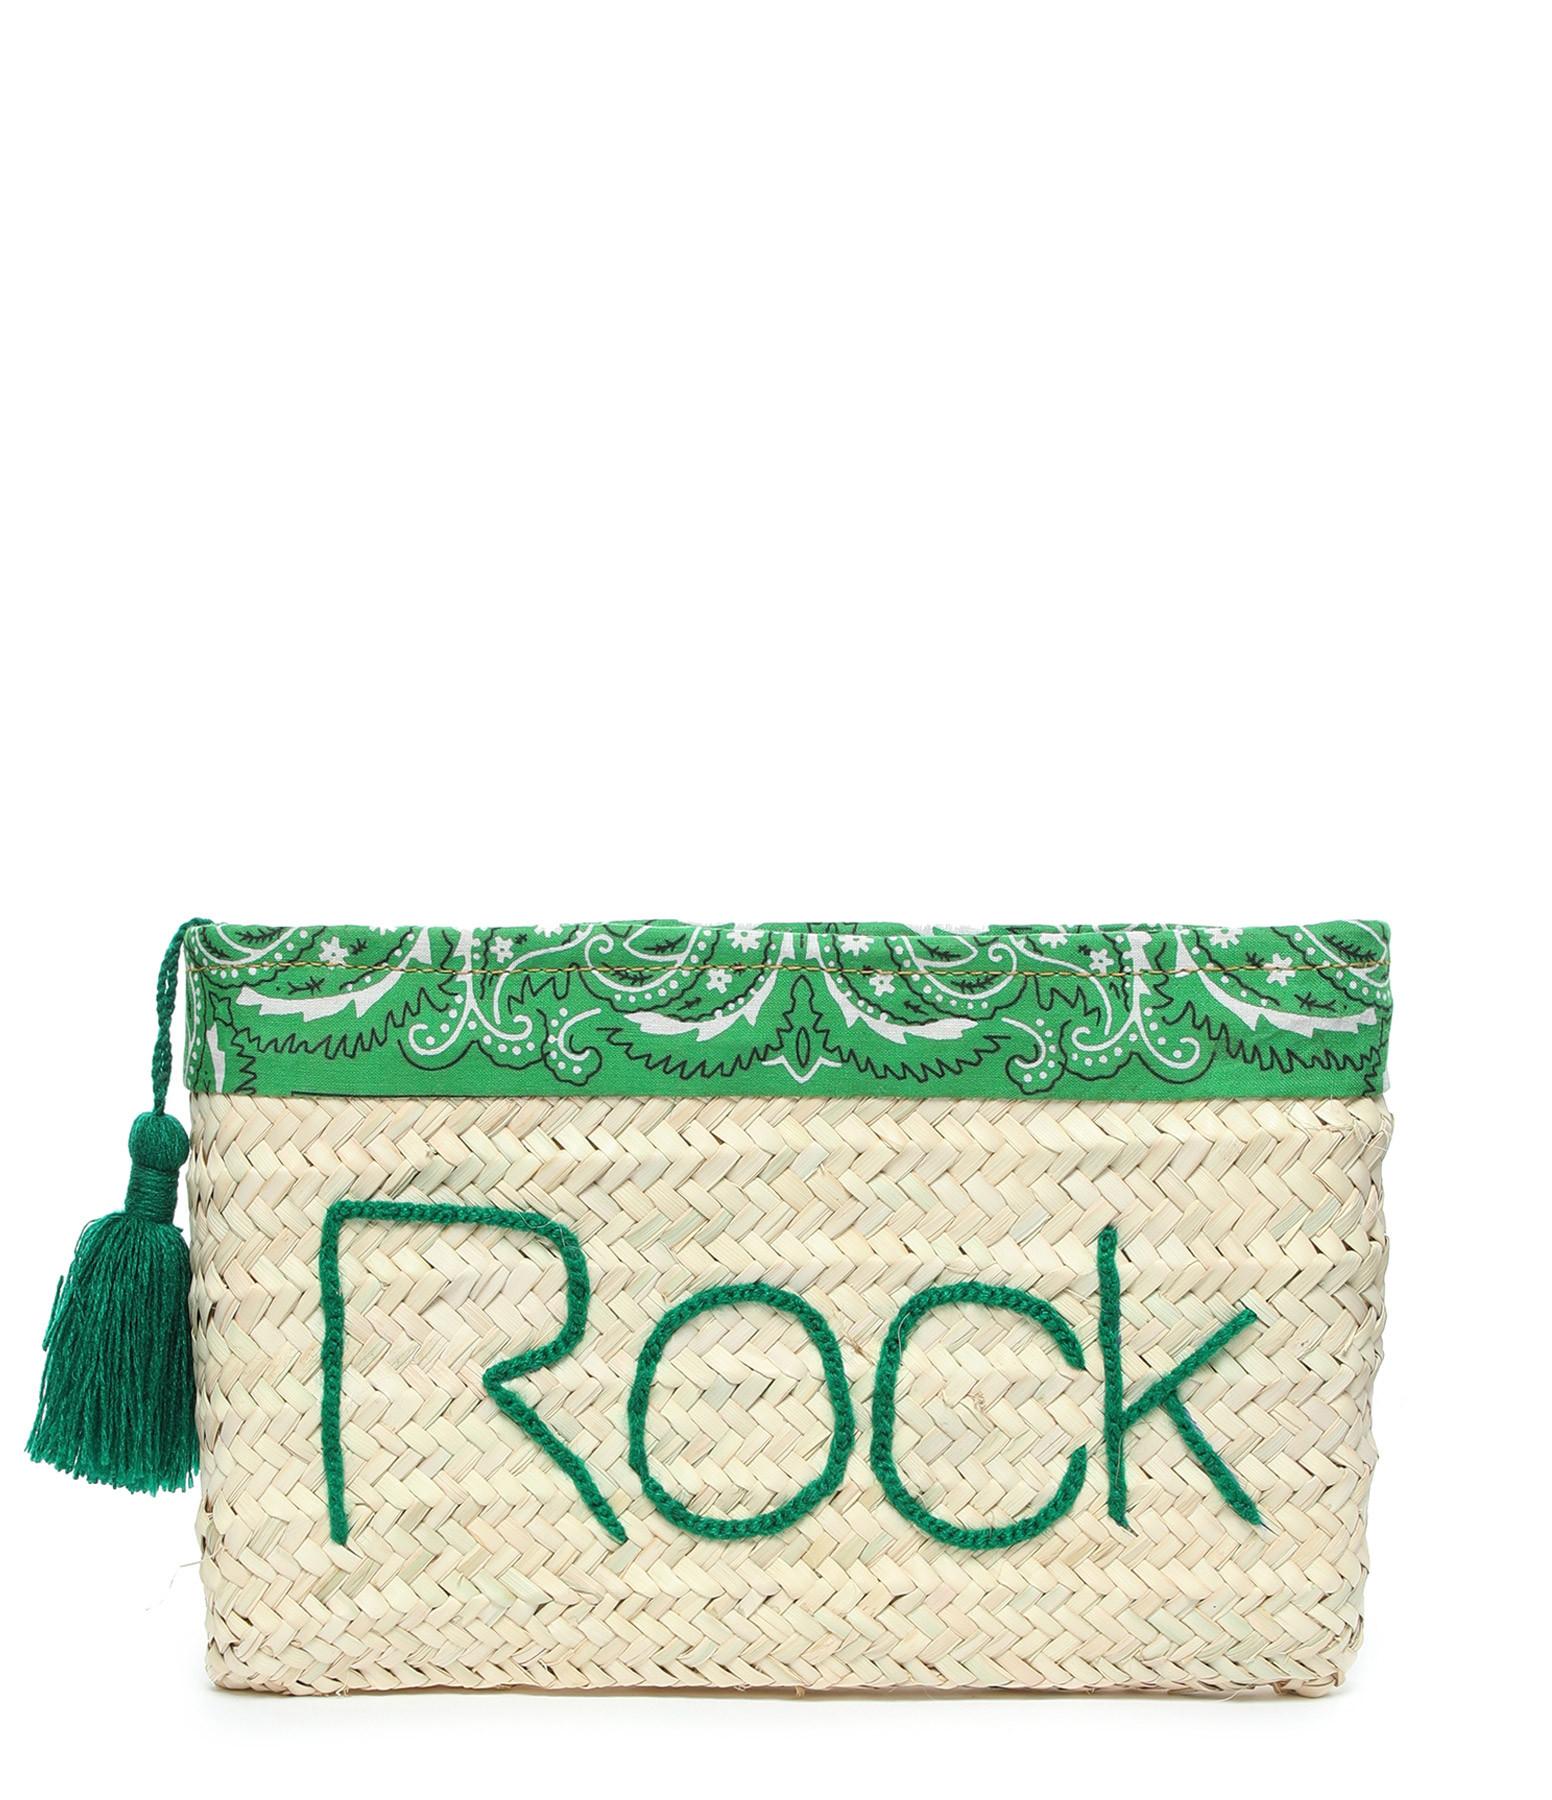 ANATA - Pochette Paille Rock Bandana Vert